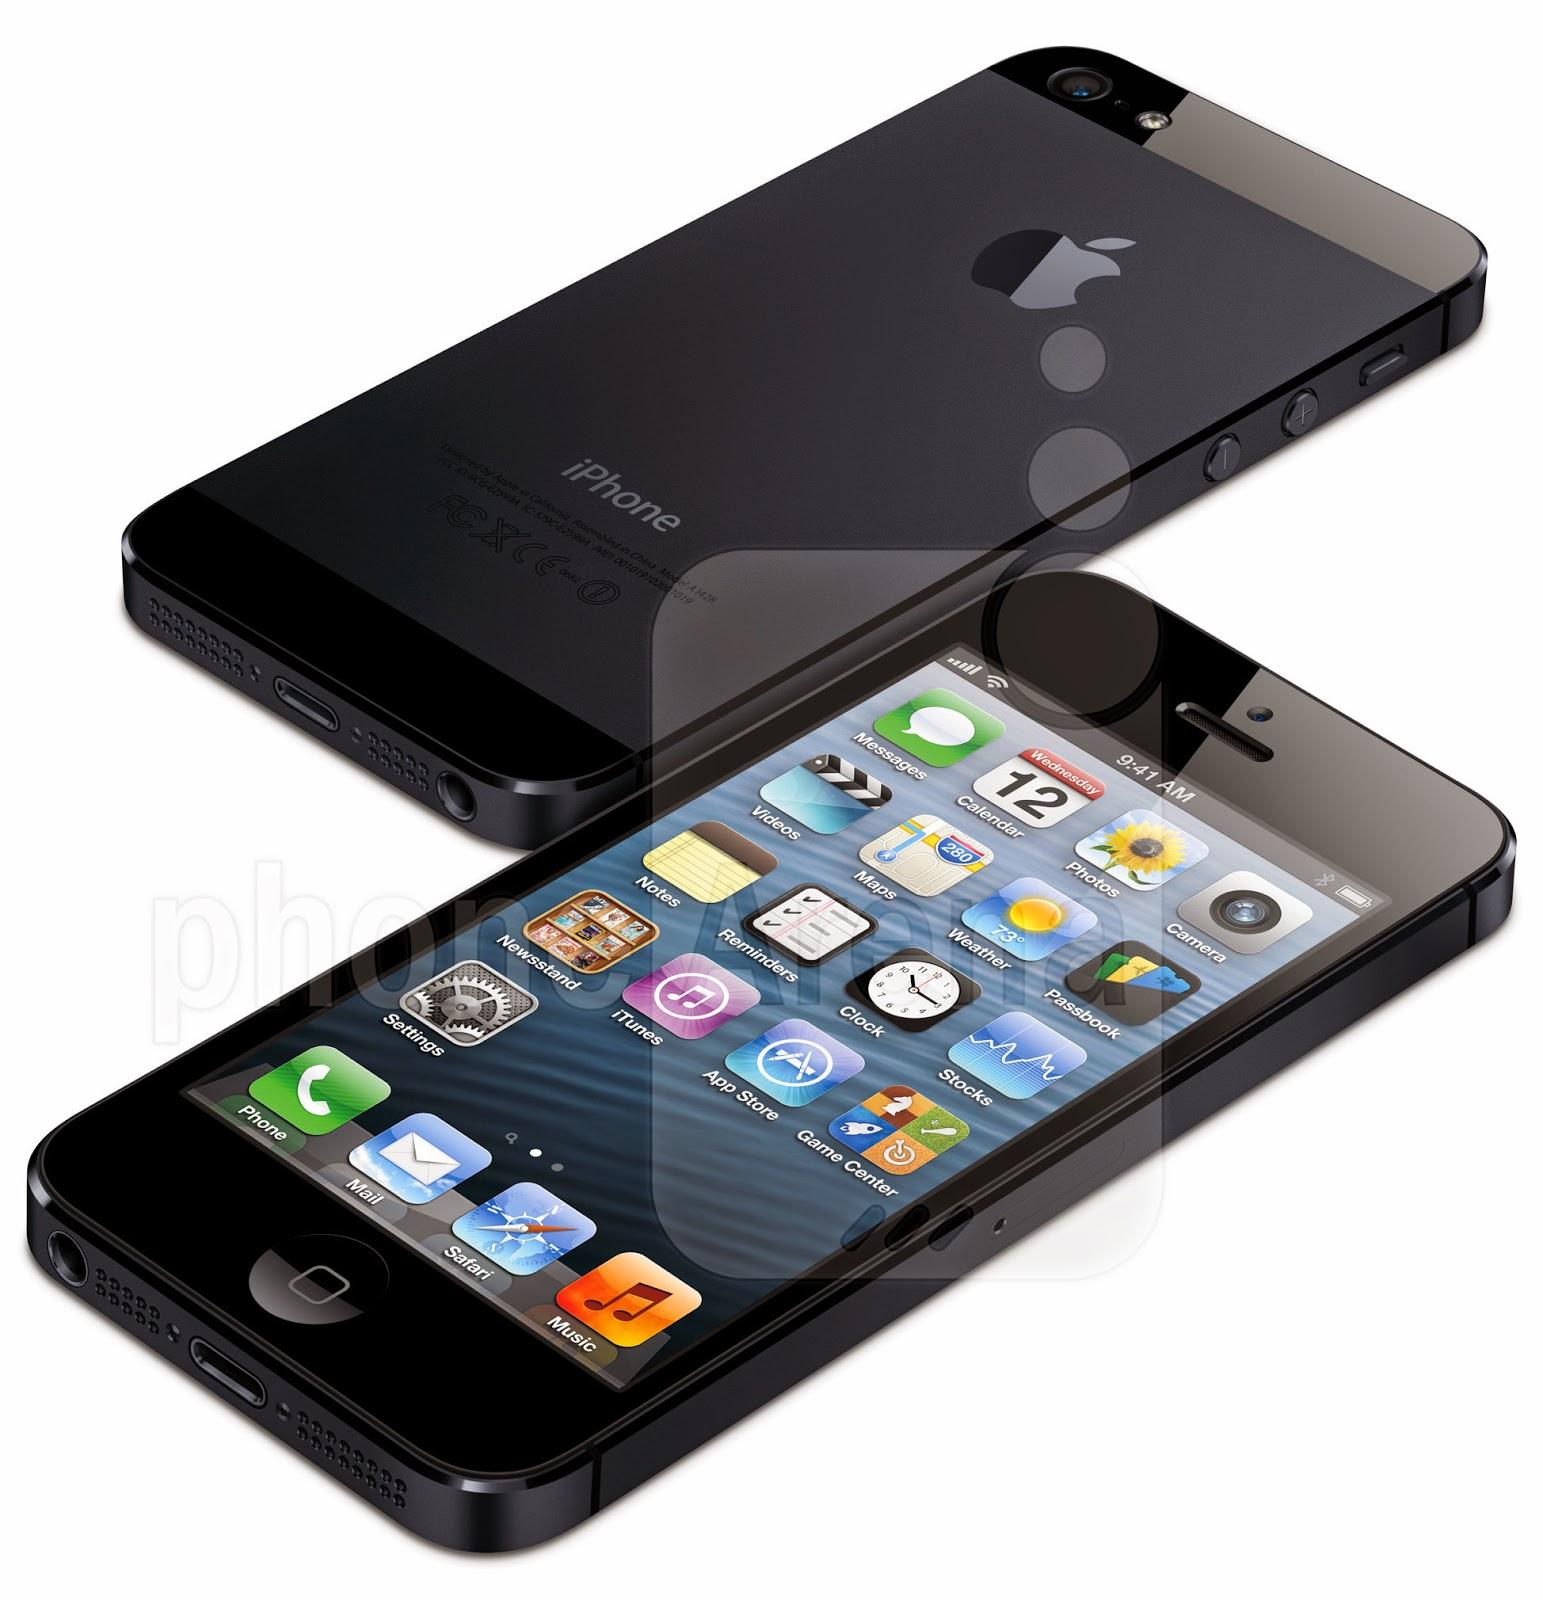 Buy Iphone: Buy Iphone Lowest Price